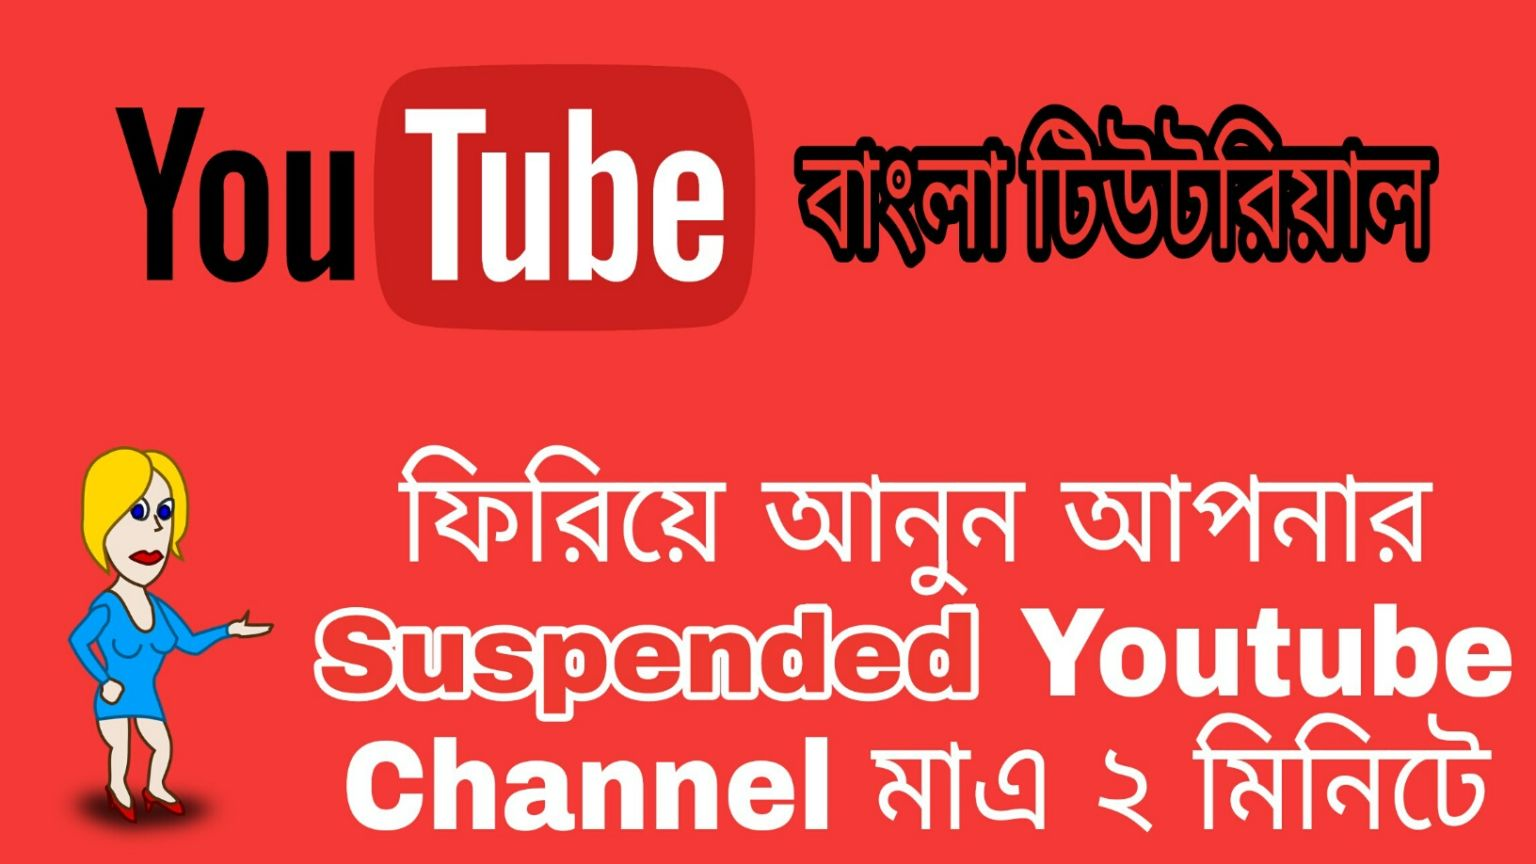 Youtube এ কিভাবে Suspended হওয়া চ্যানেল ফিরিয়ে আনবেন!! মাএ ২ মিনিটের কাজ!!